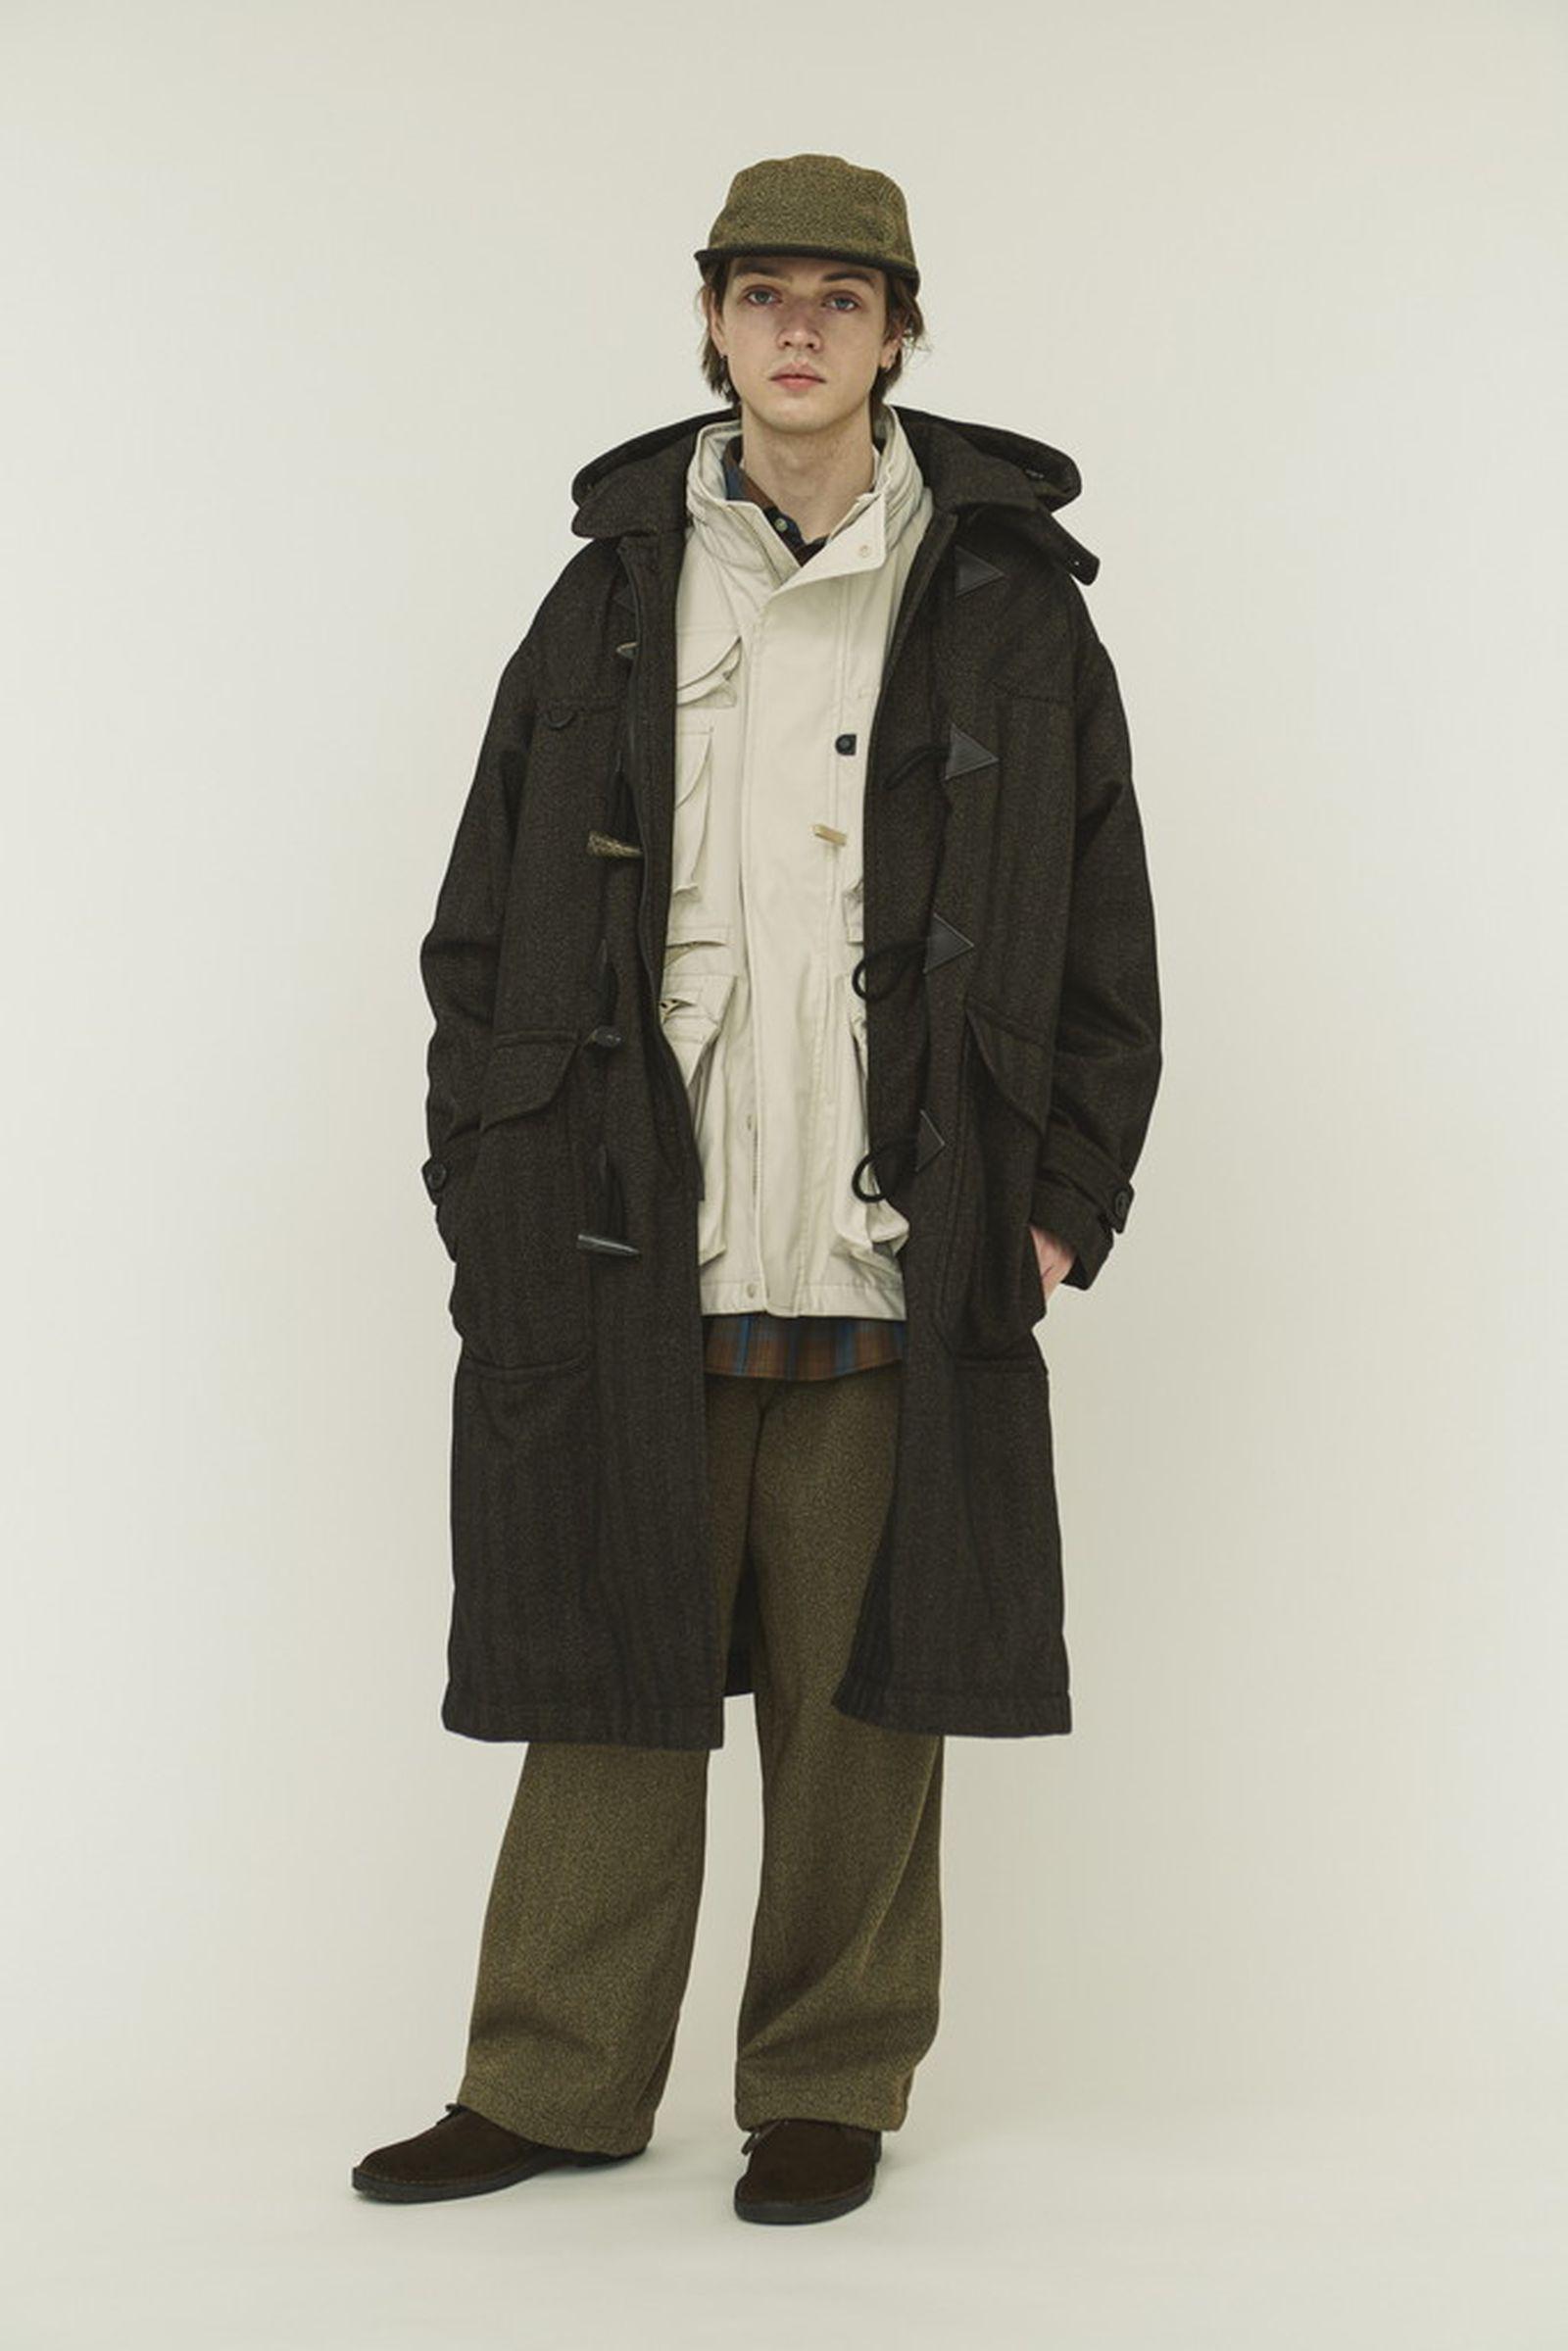 daiwa-pier39-fall-winter-2021-collection-01